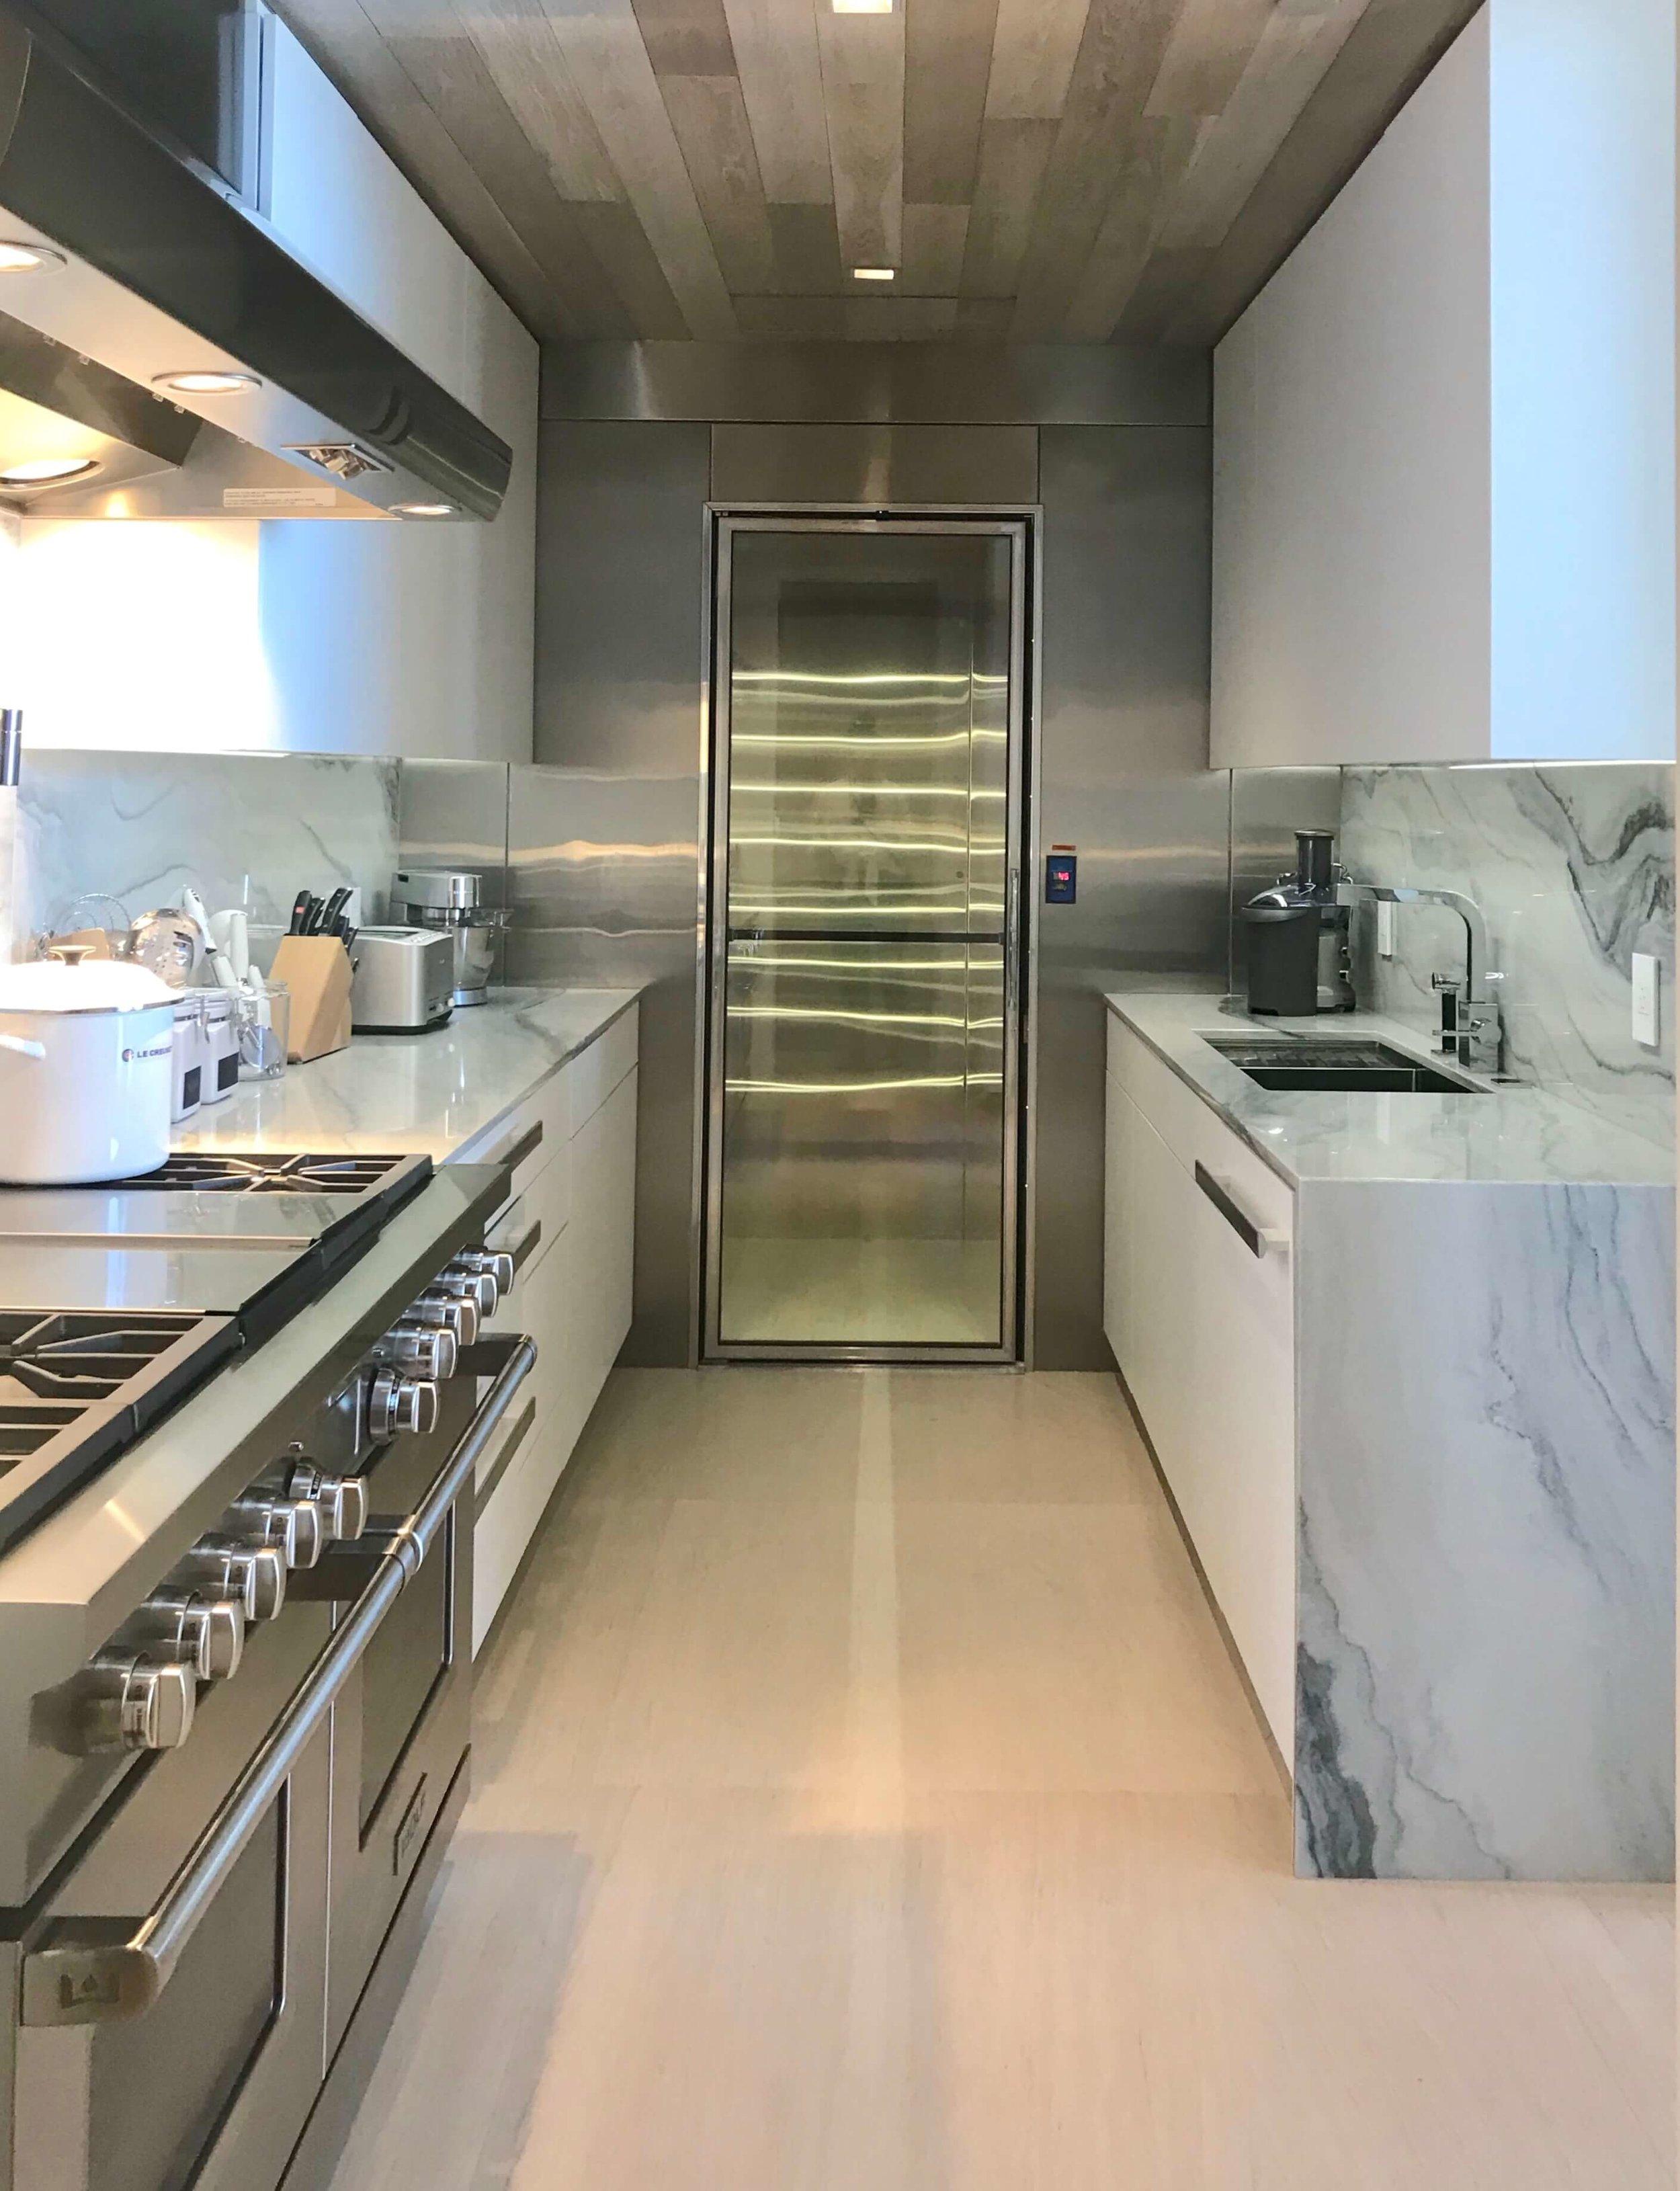 Malibu Home Tour, Dwell on Design - Burdge and Associates Architects | #contemporaryarchitecture #kitchen #luxuryinteriors